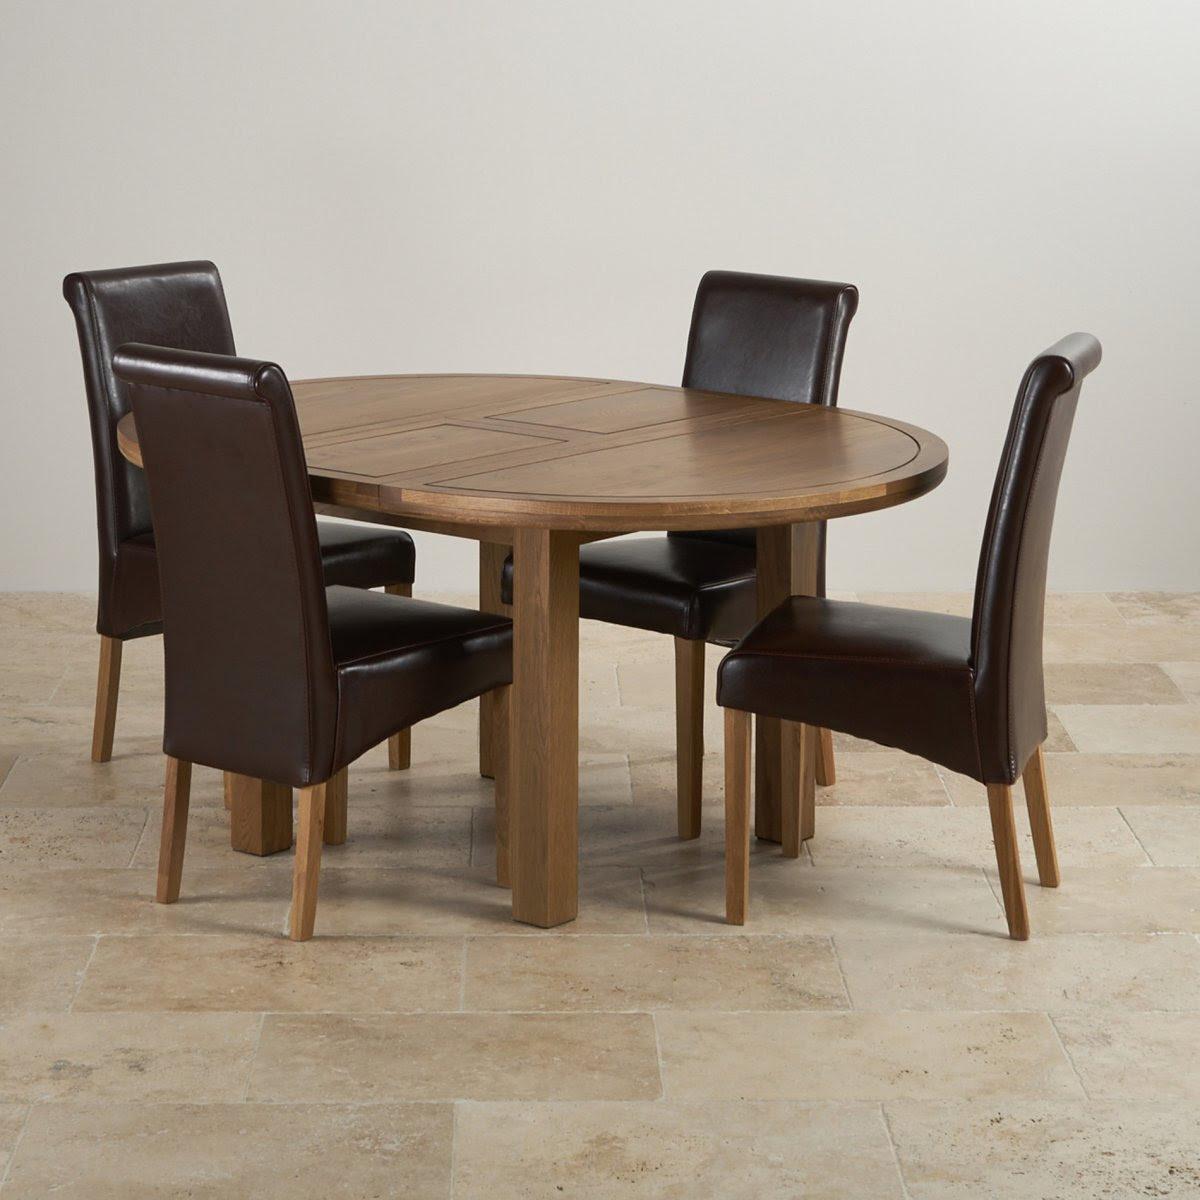 Knightsbridge Round Extending Dining Table Set: Table + 4 ...